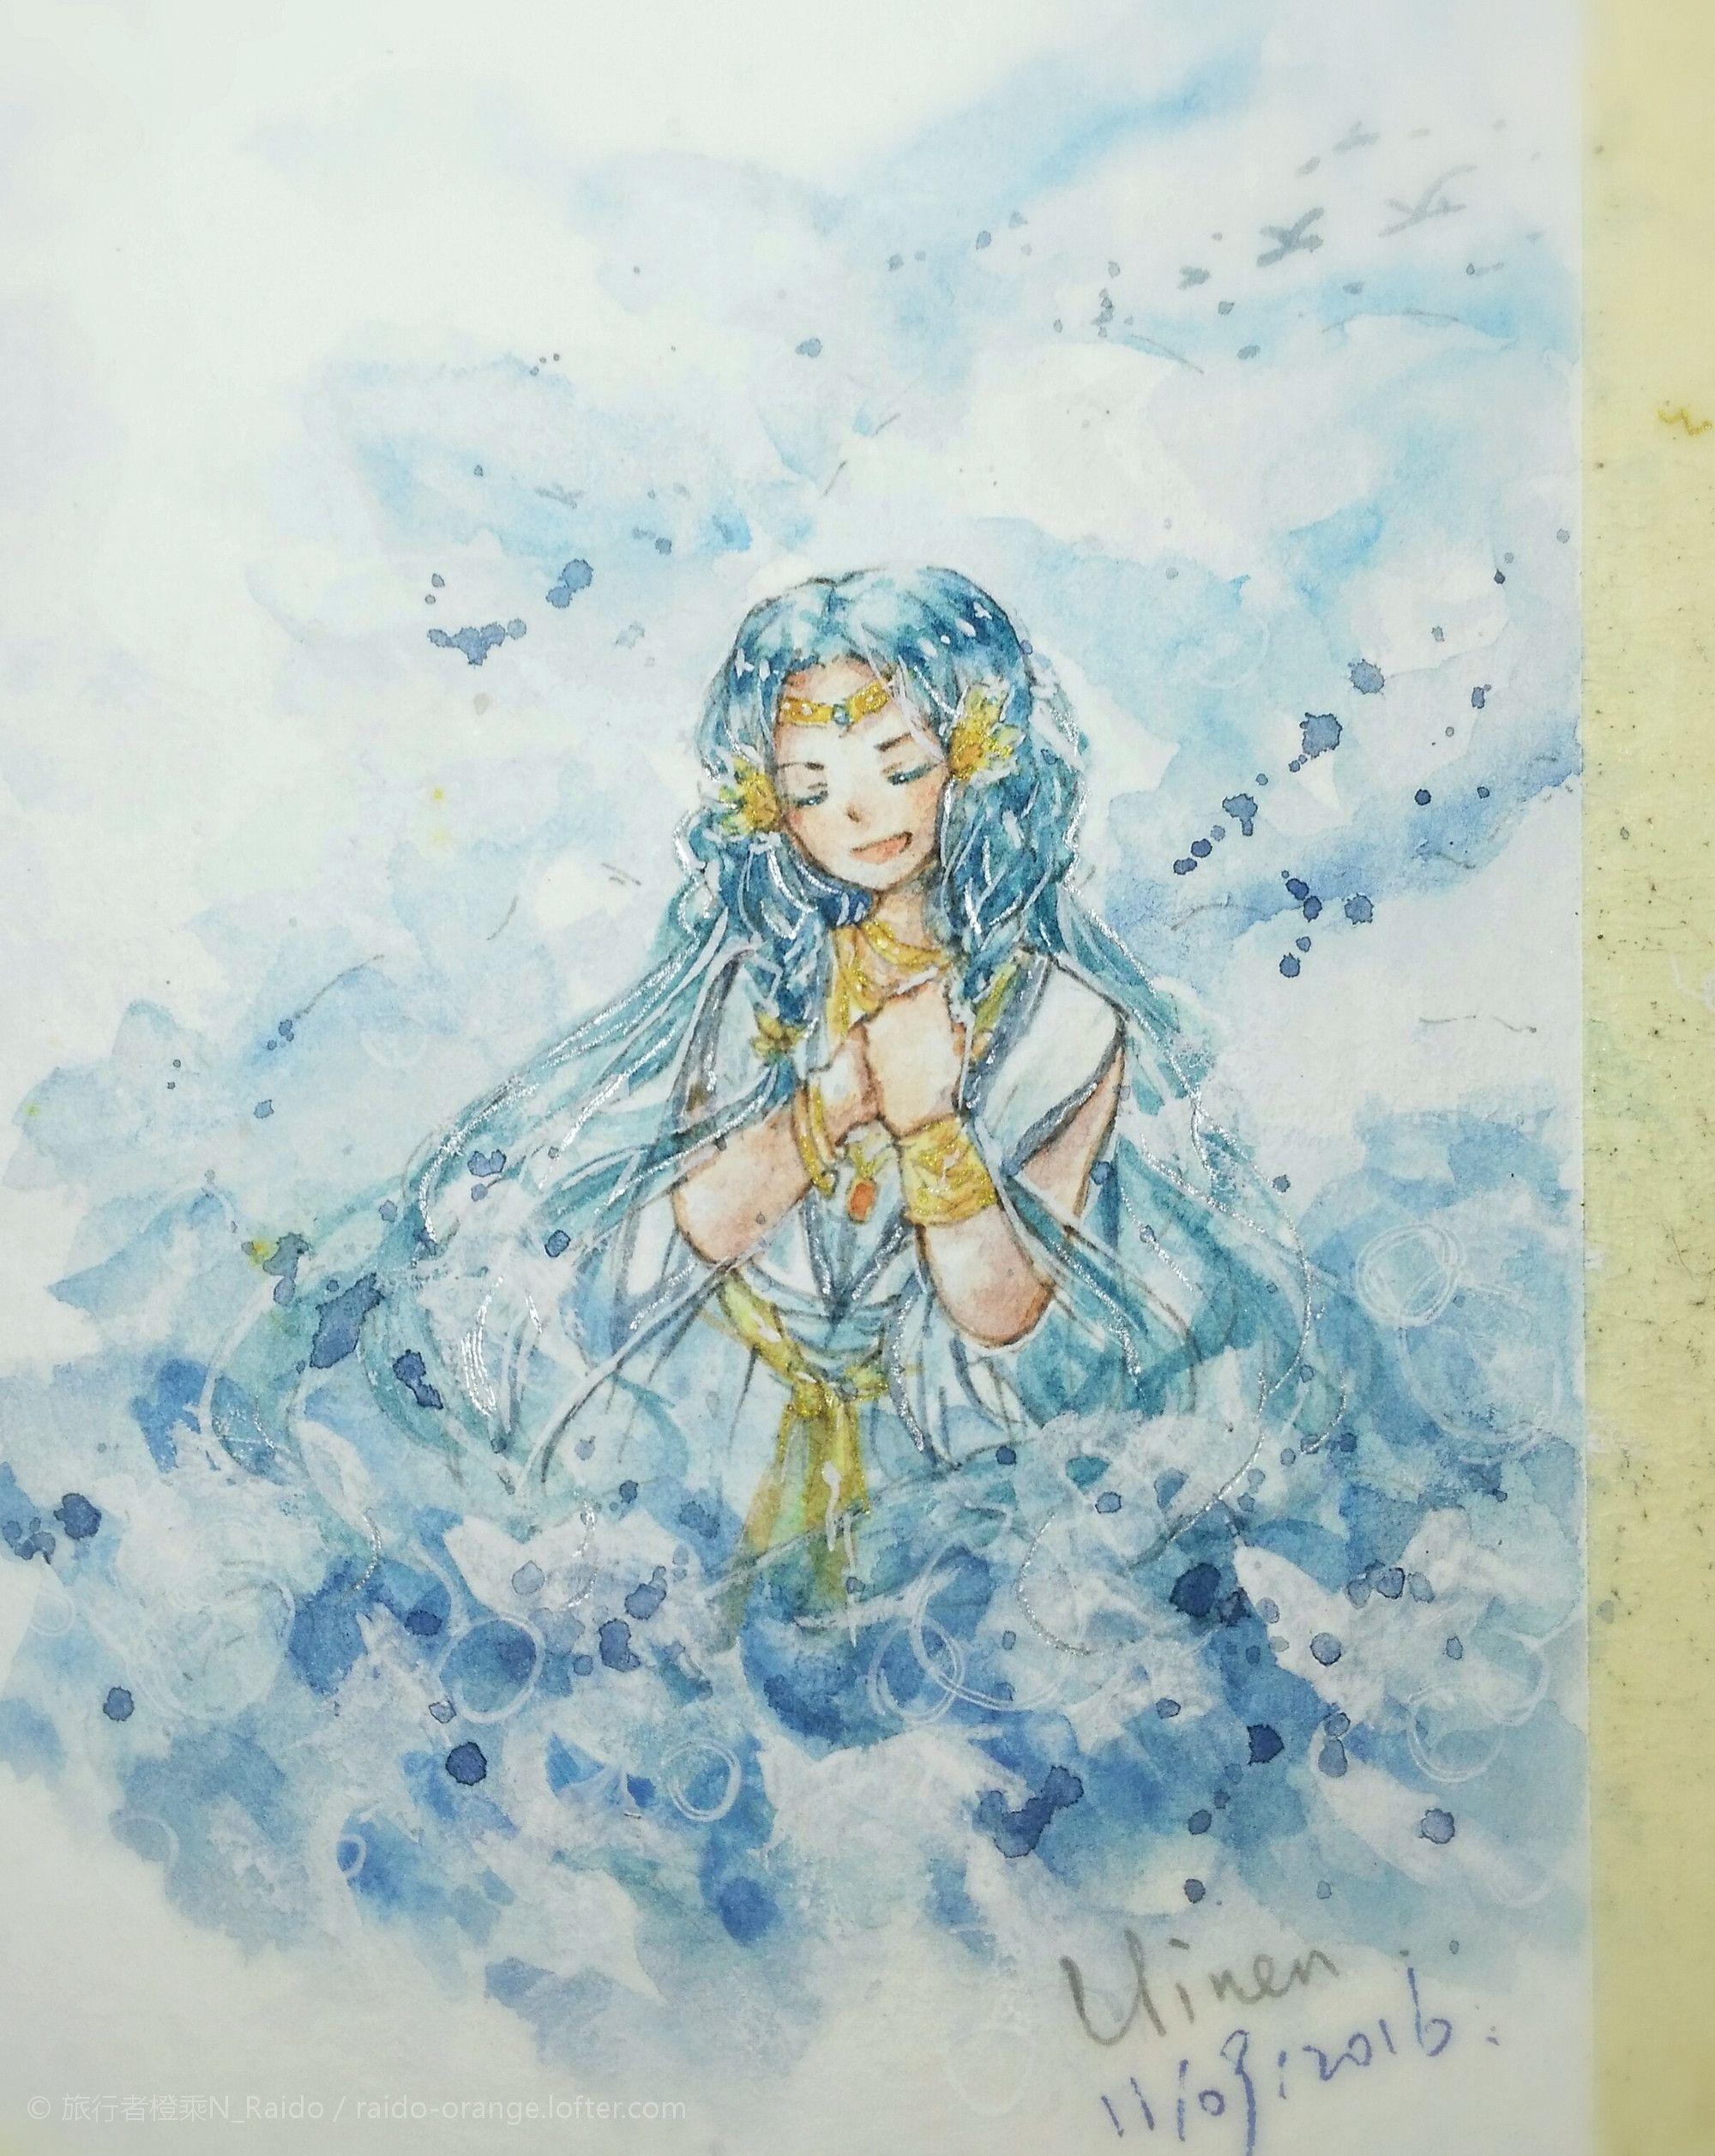 Uinen